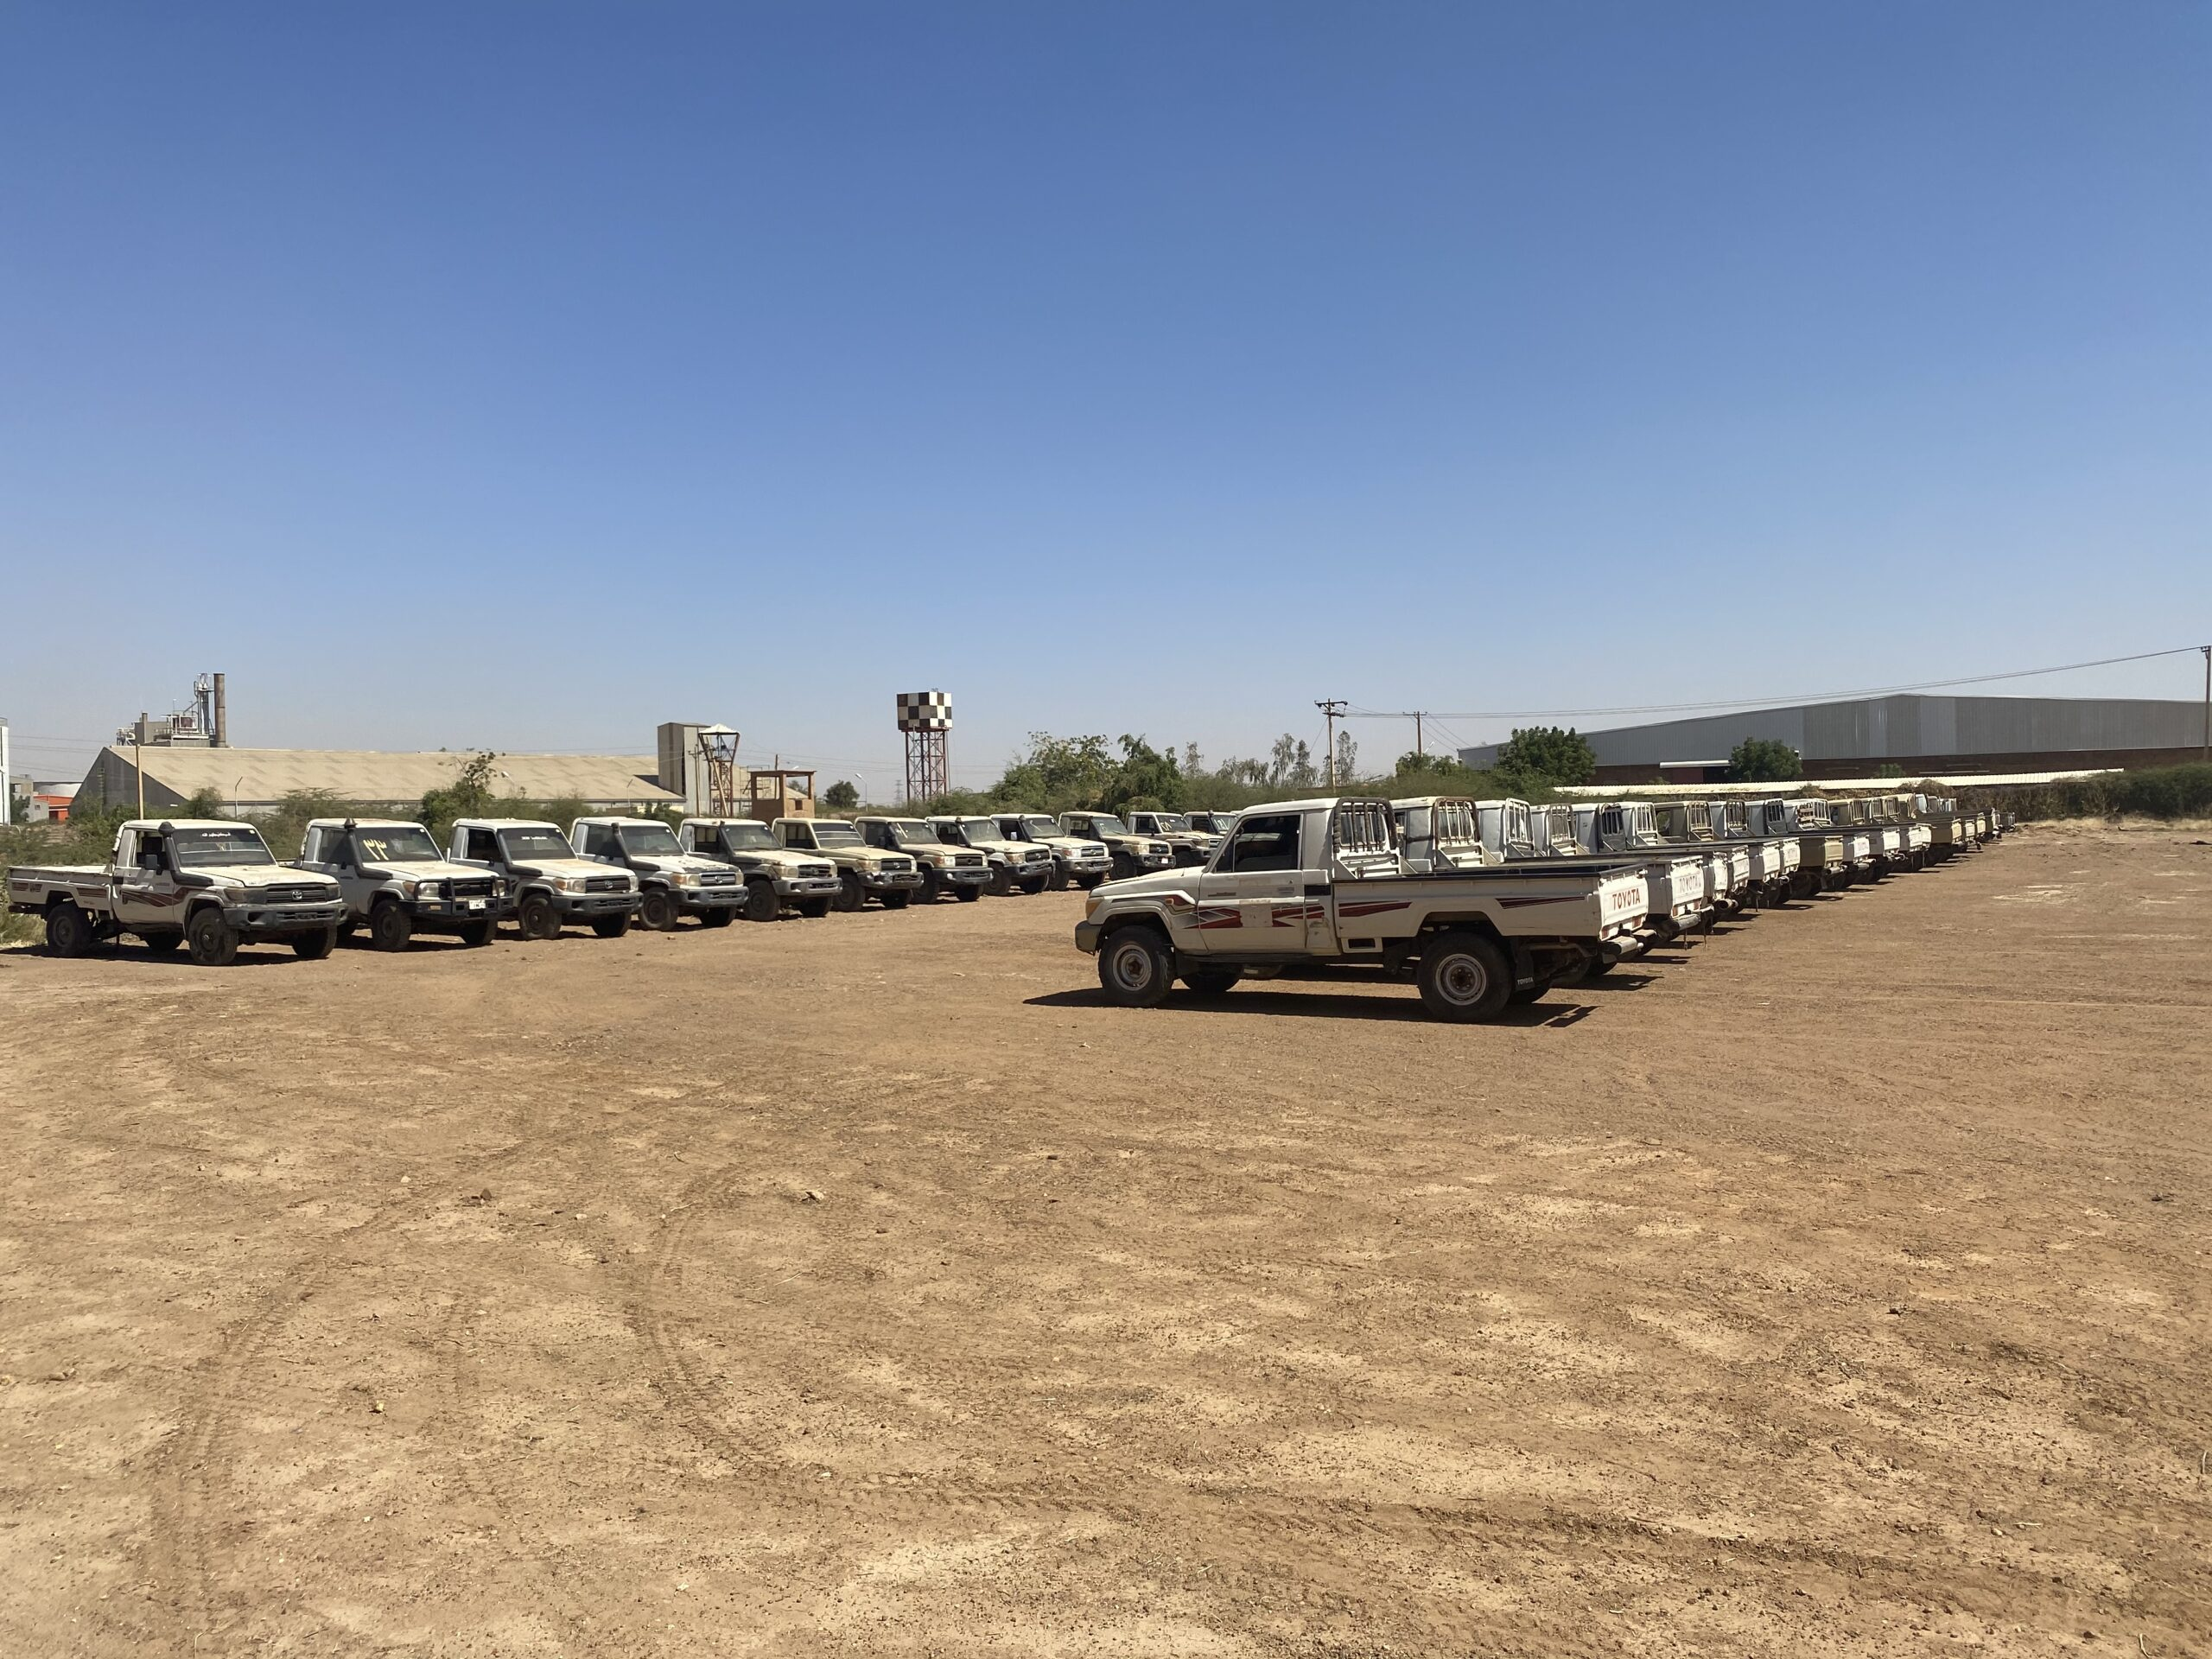 Northern Africa: Fleet overhaul and maintenance